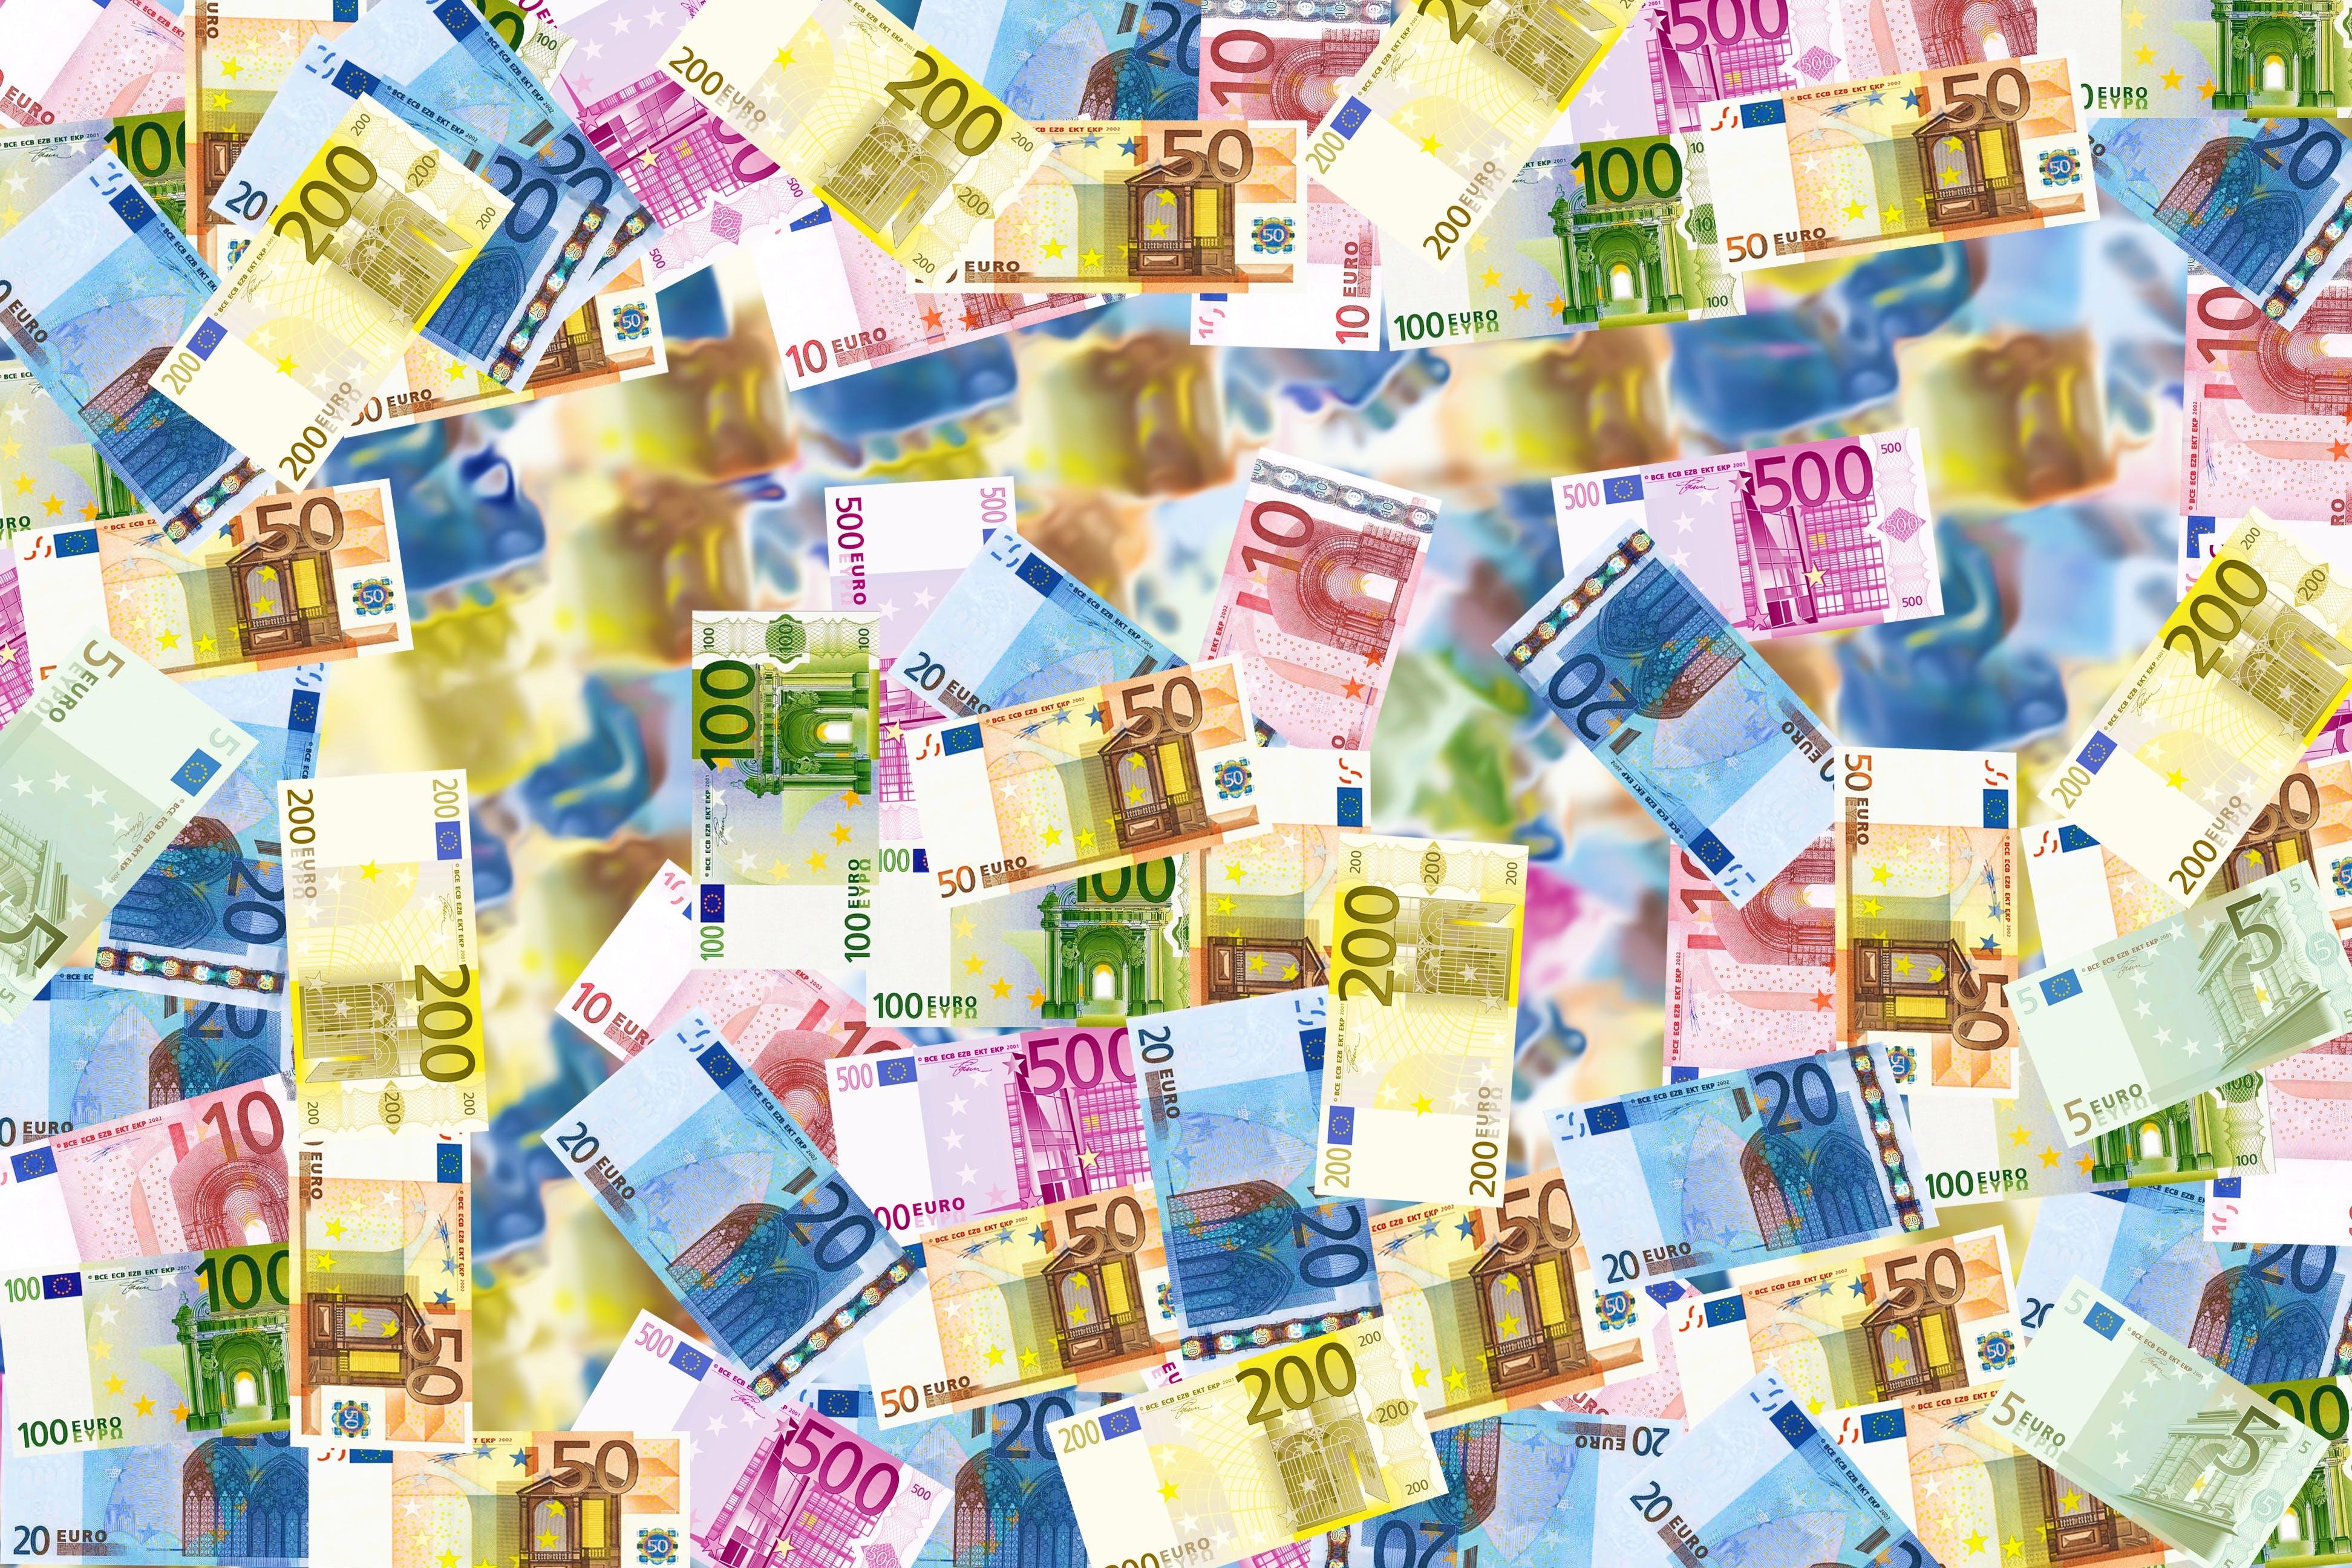 Kostnadsfri bild av ekonomi, kontanter, pengar, rikedom